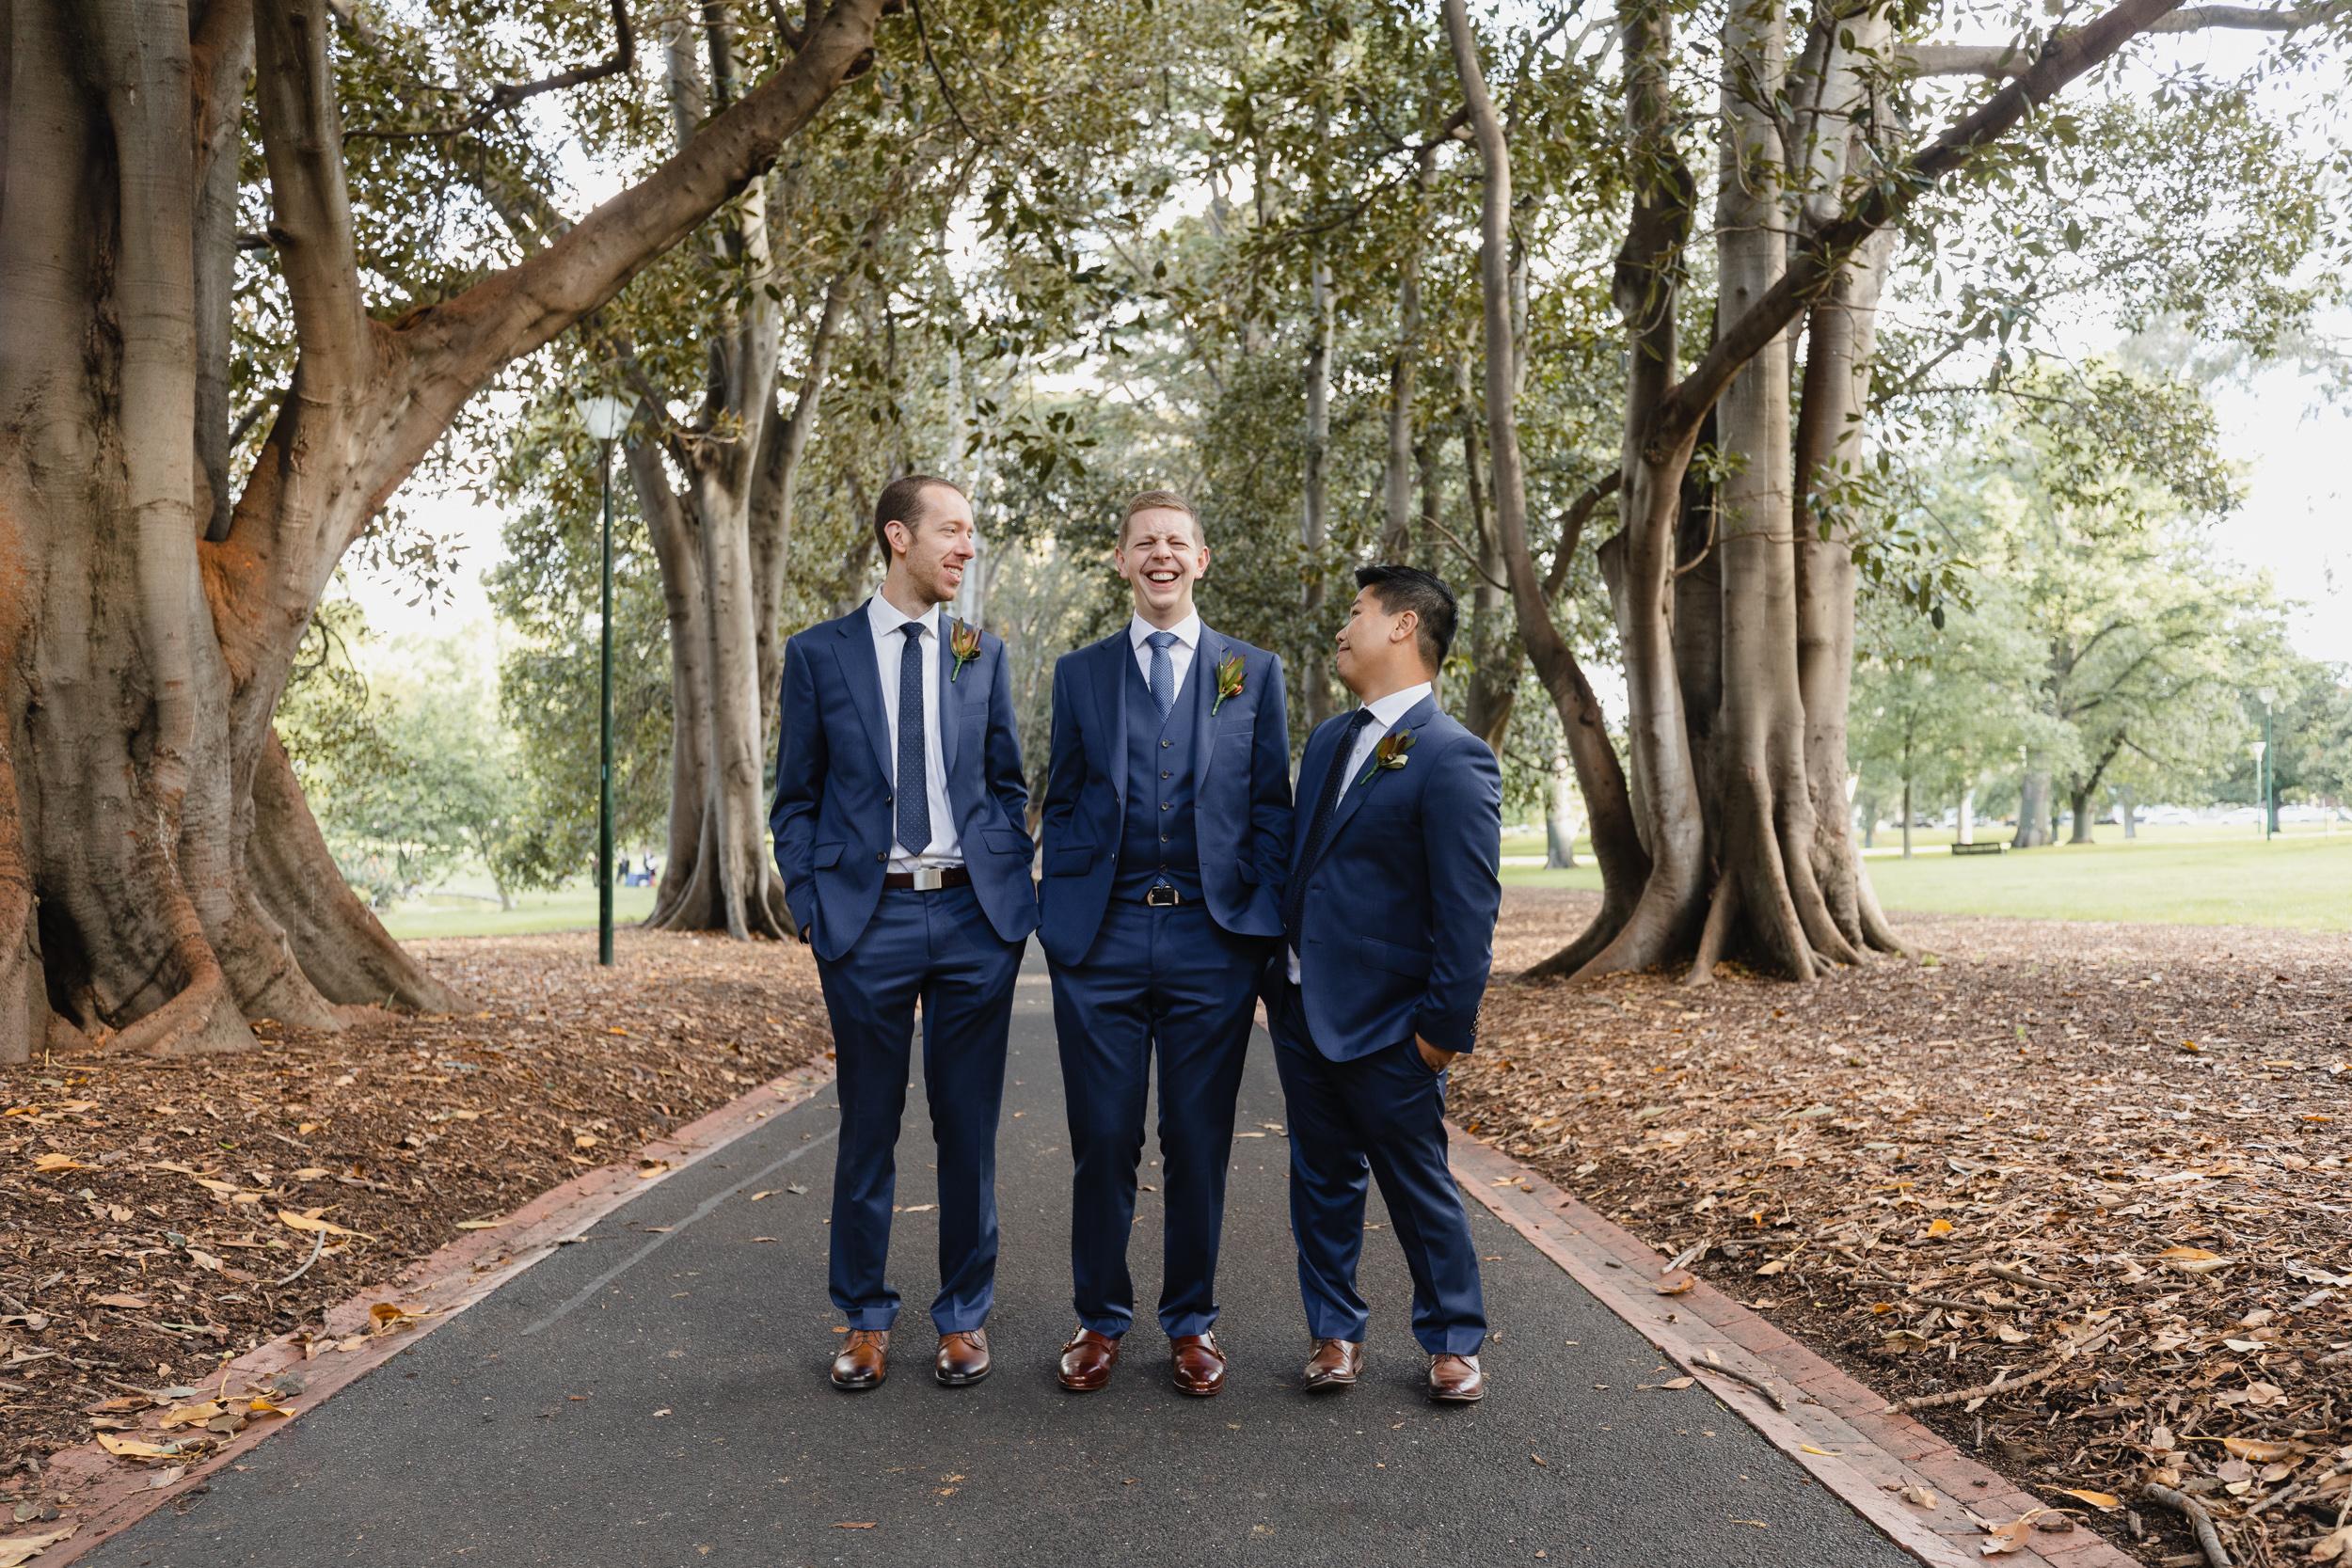 Folkstone-LB-Wedding-Web-260.JPG